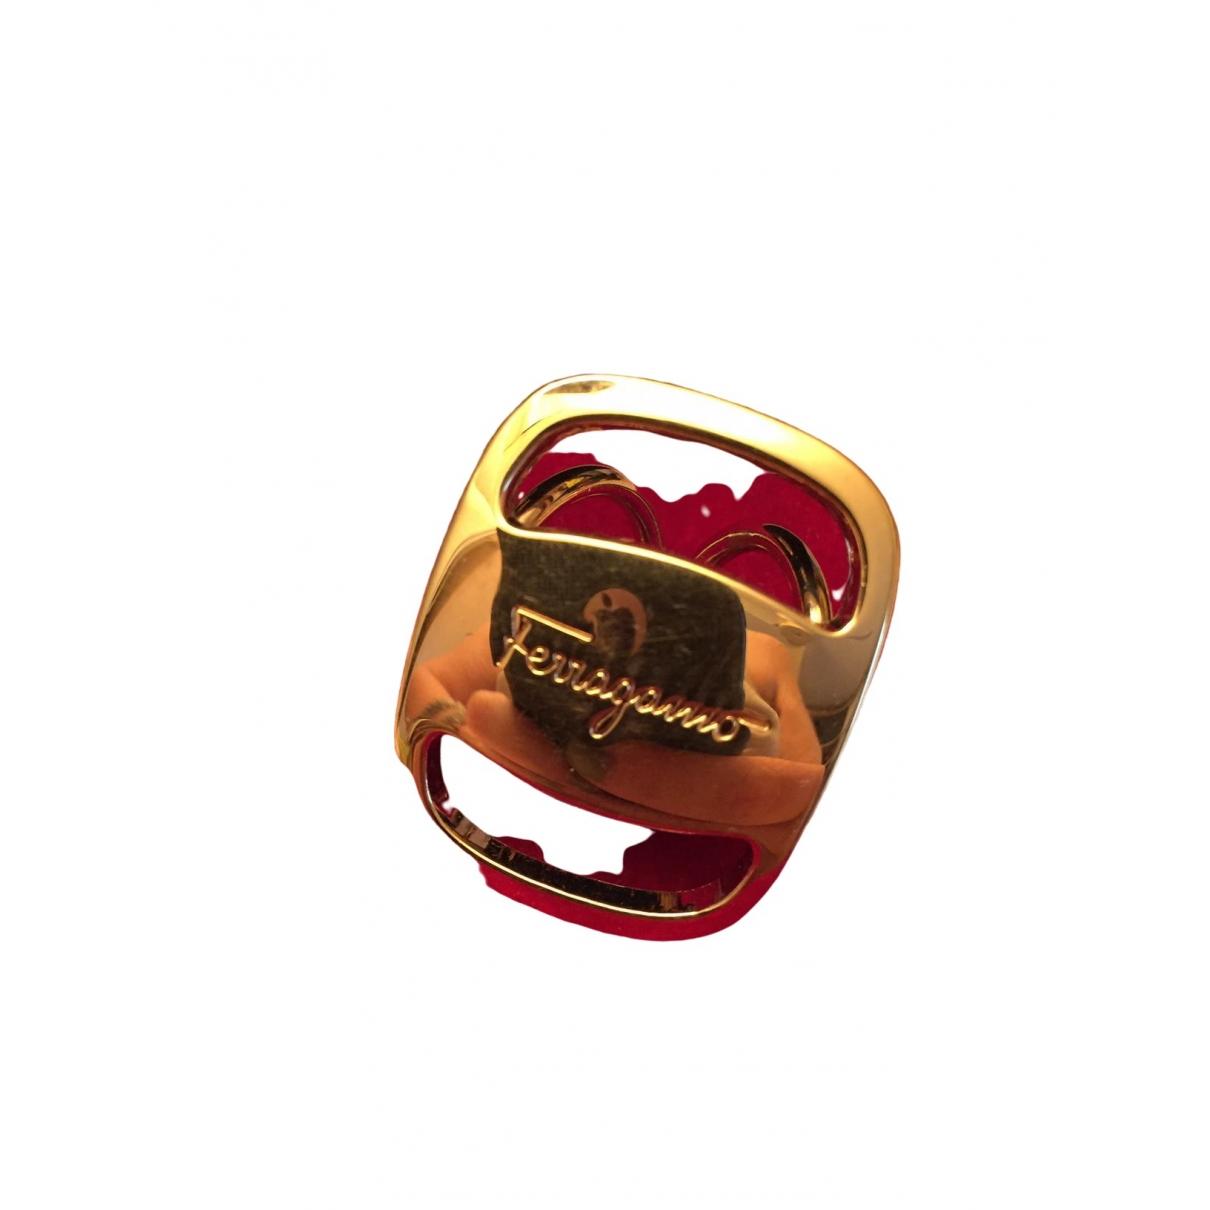 Salvatore Ferragamo \N Gold scarf for Women \N